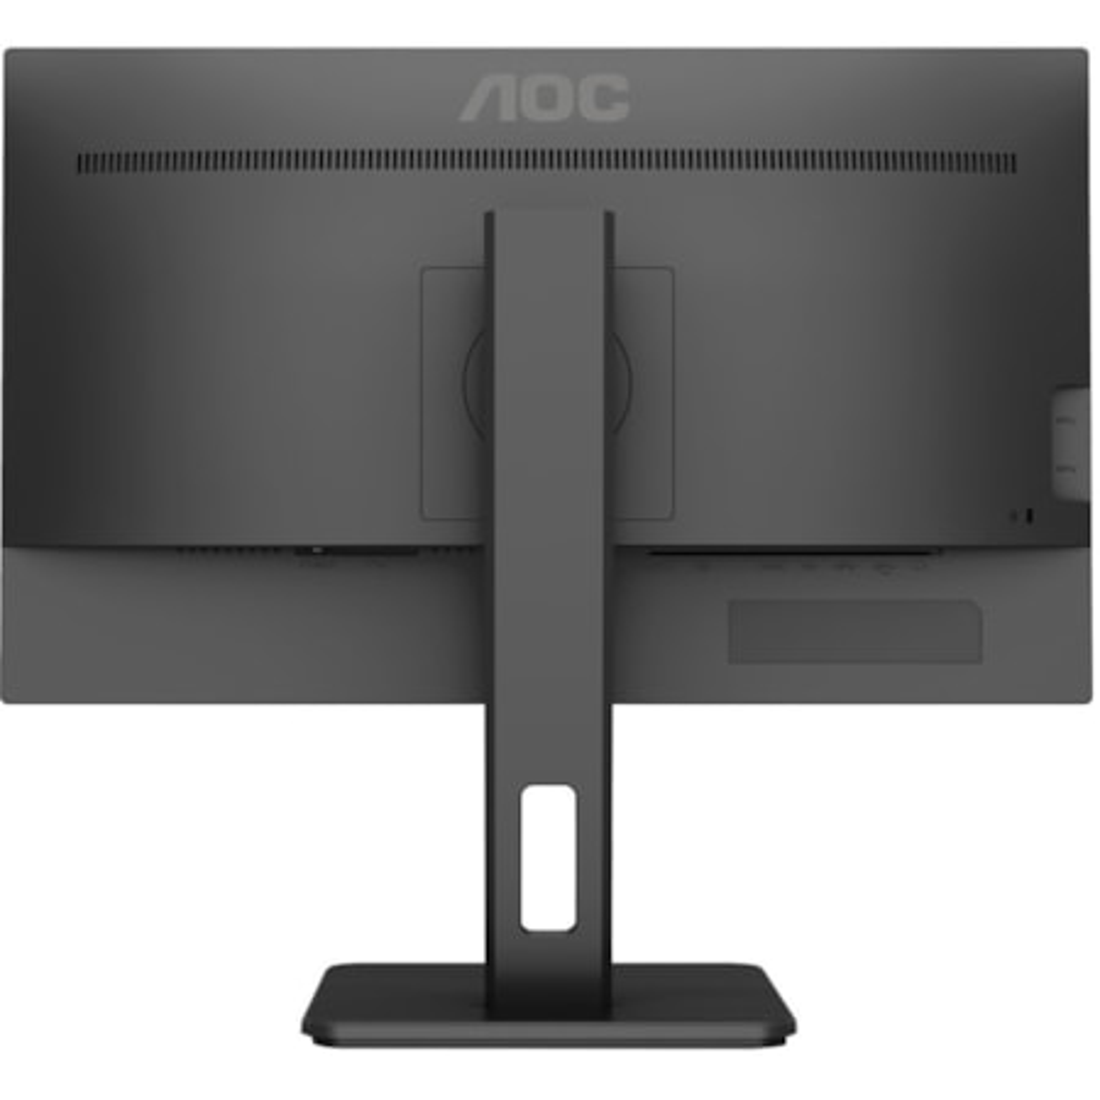 "AOC 24P2Q 60.5 cm (23.8"") Full HD WLED LCD Monitor - 16:9 - Black"